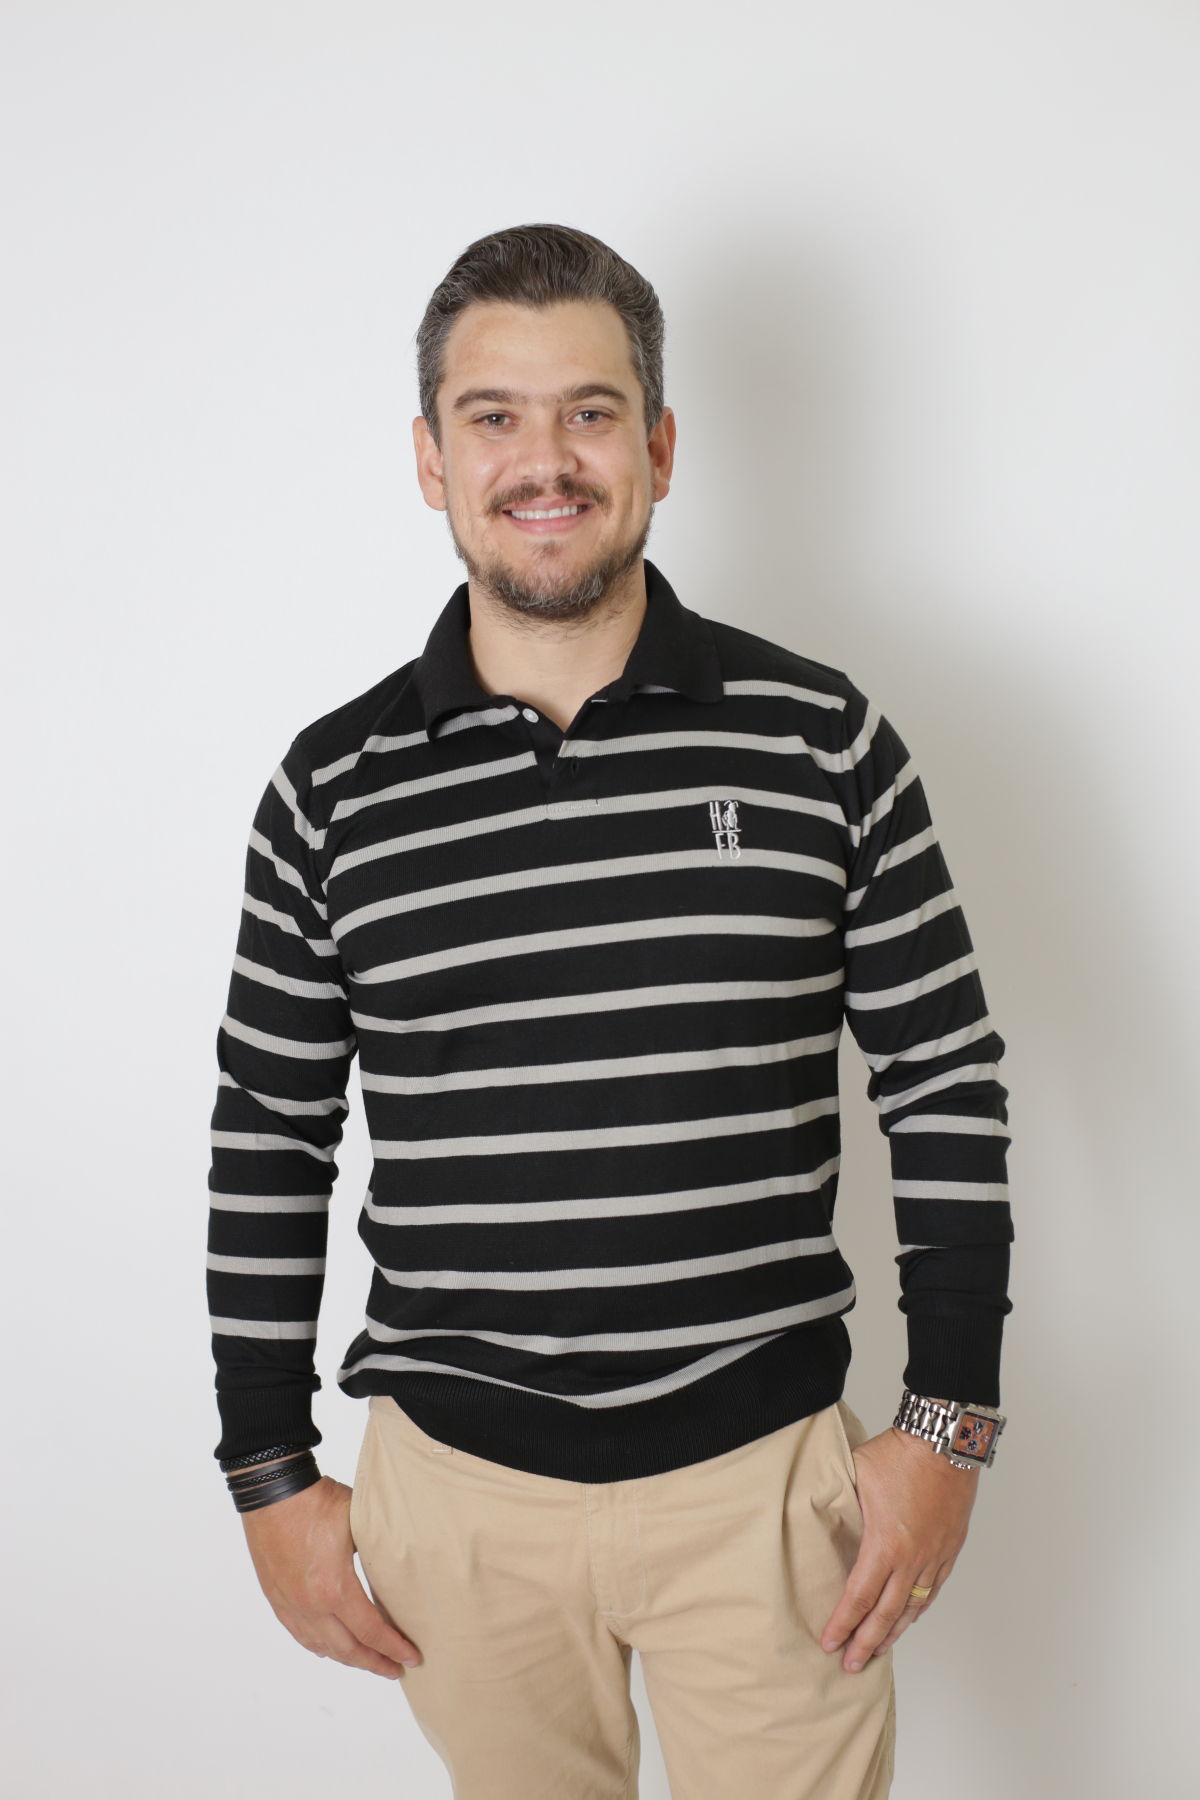 Camisa Polo Suéter Listrado Adulto